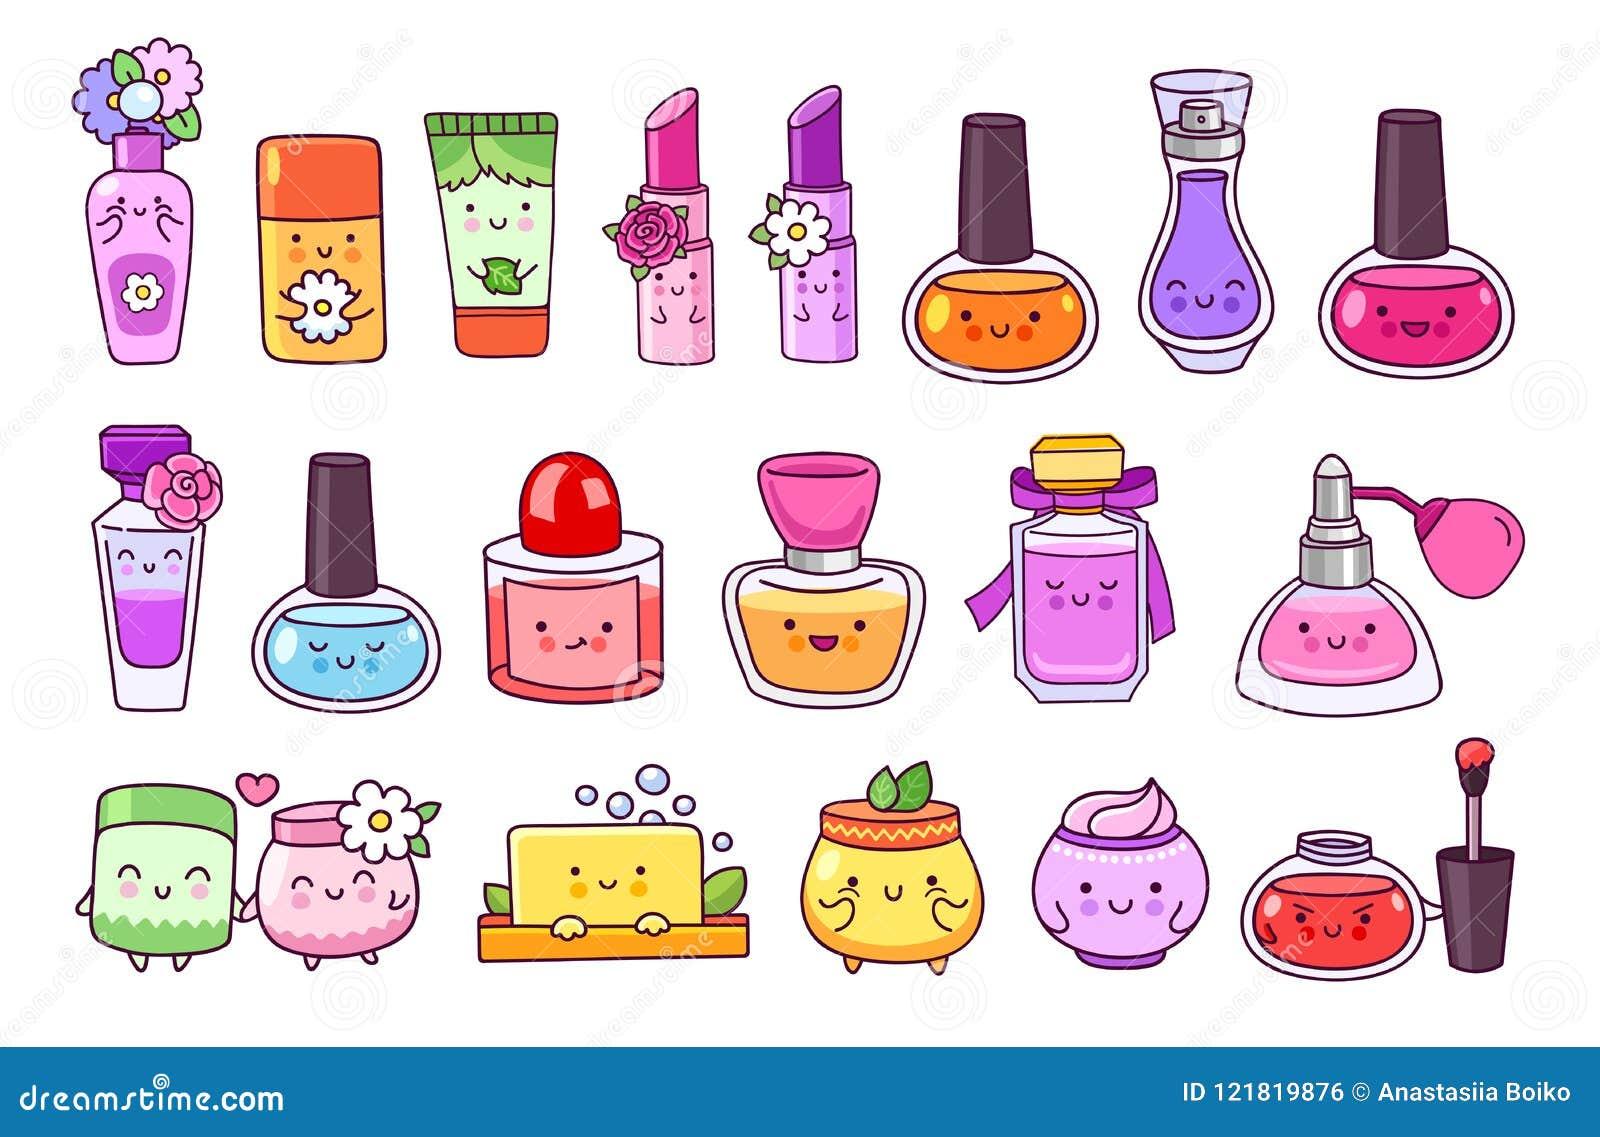 Parfüm, Kosmetik, Nagellack, Lippenstift, Lipgloss, Cremetiegel, Seife und Shampoo